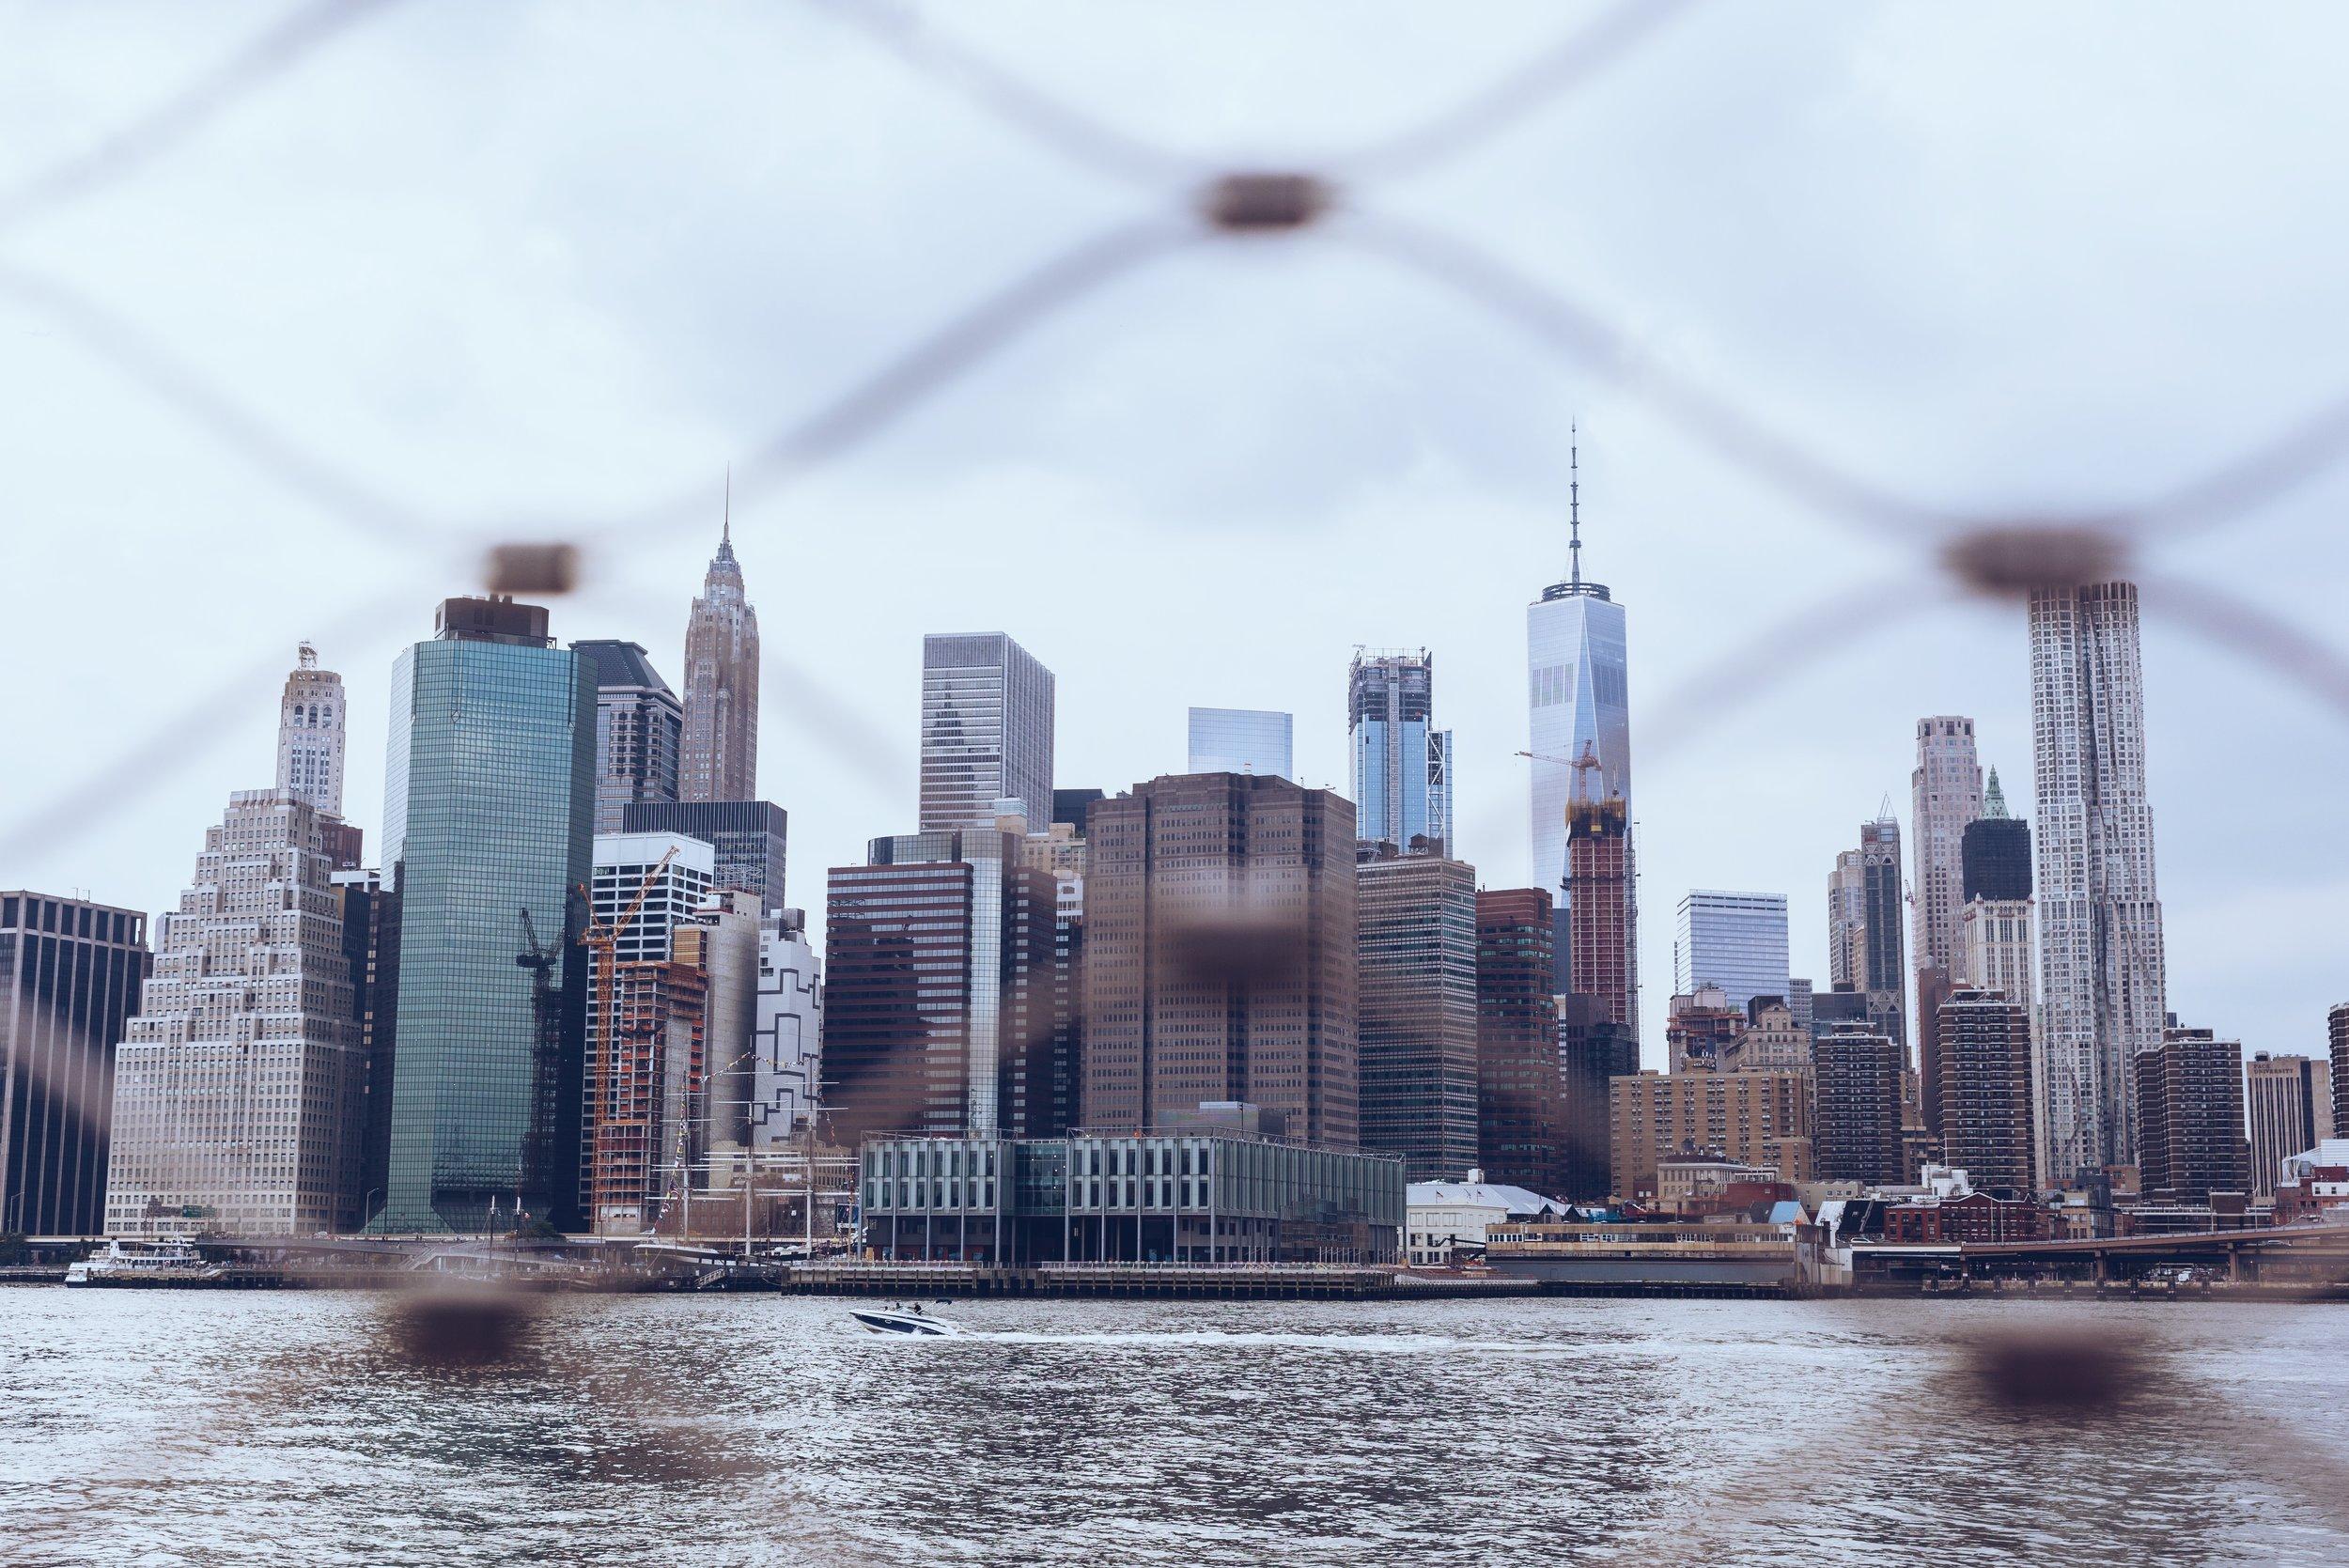 NYC-PY1.JPG